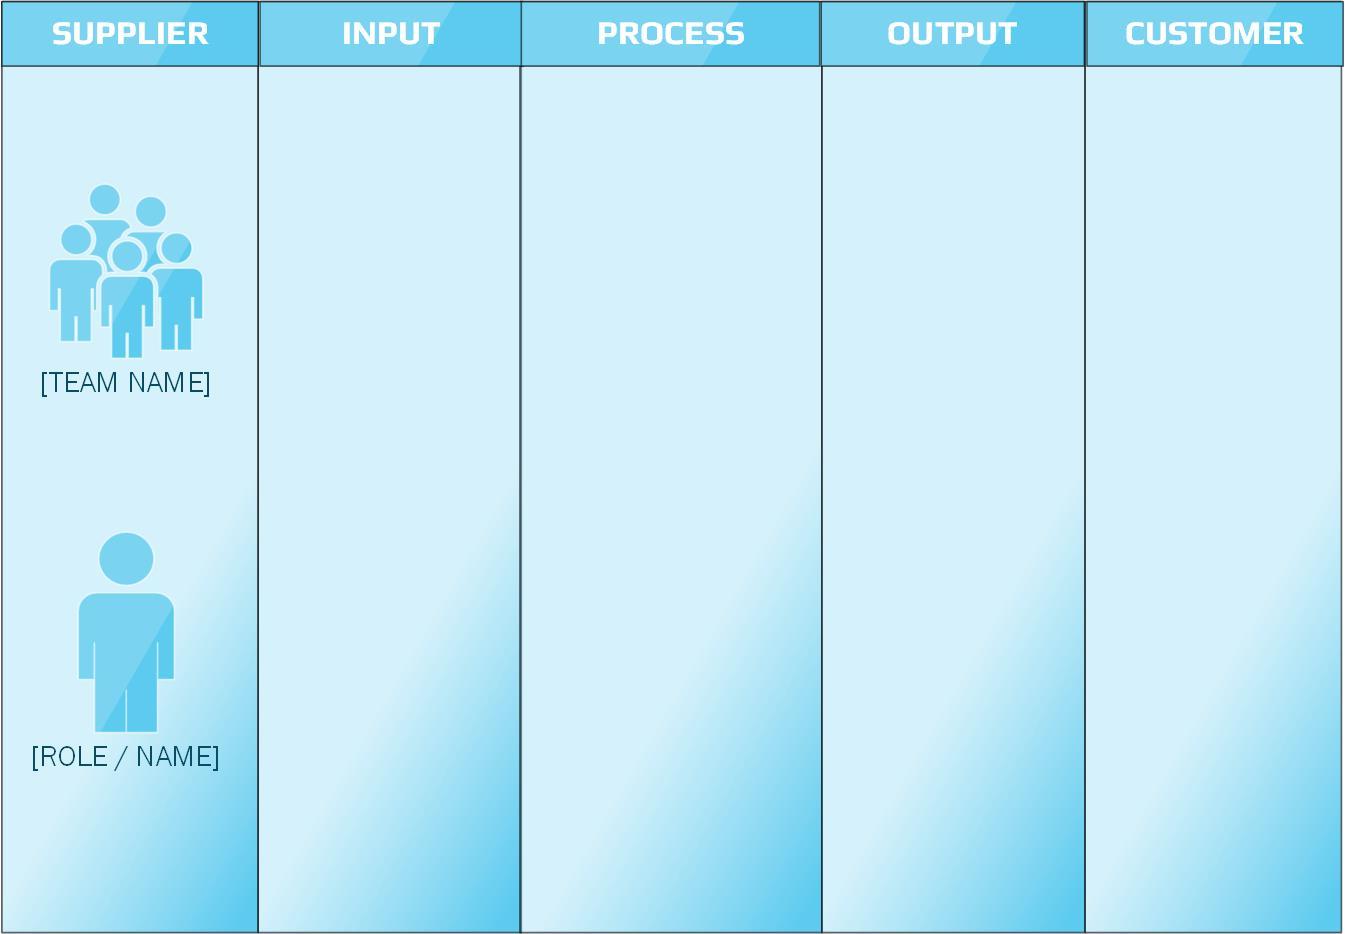 SIPOC Diagram Supplier